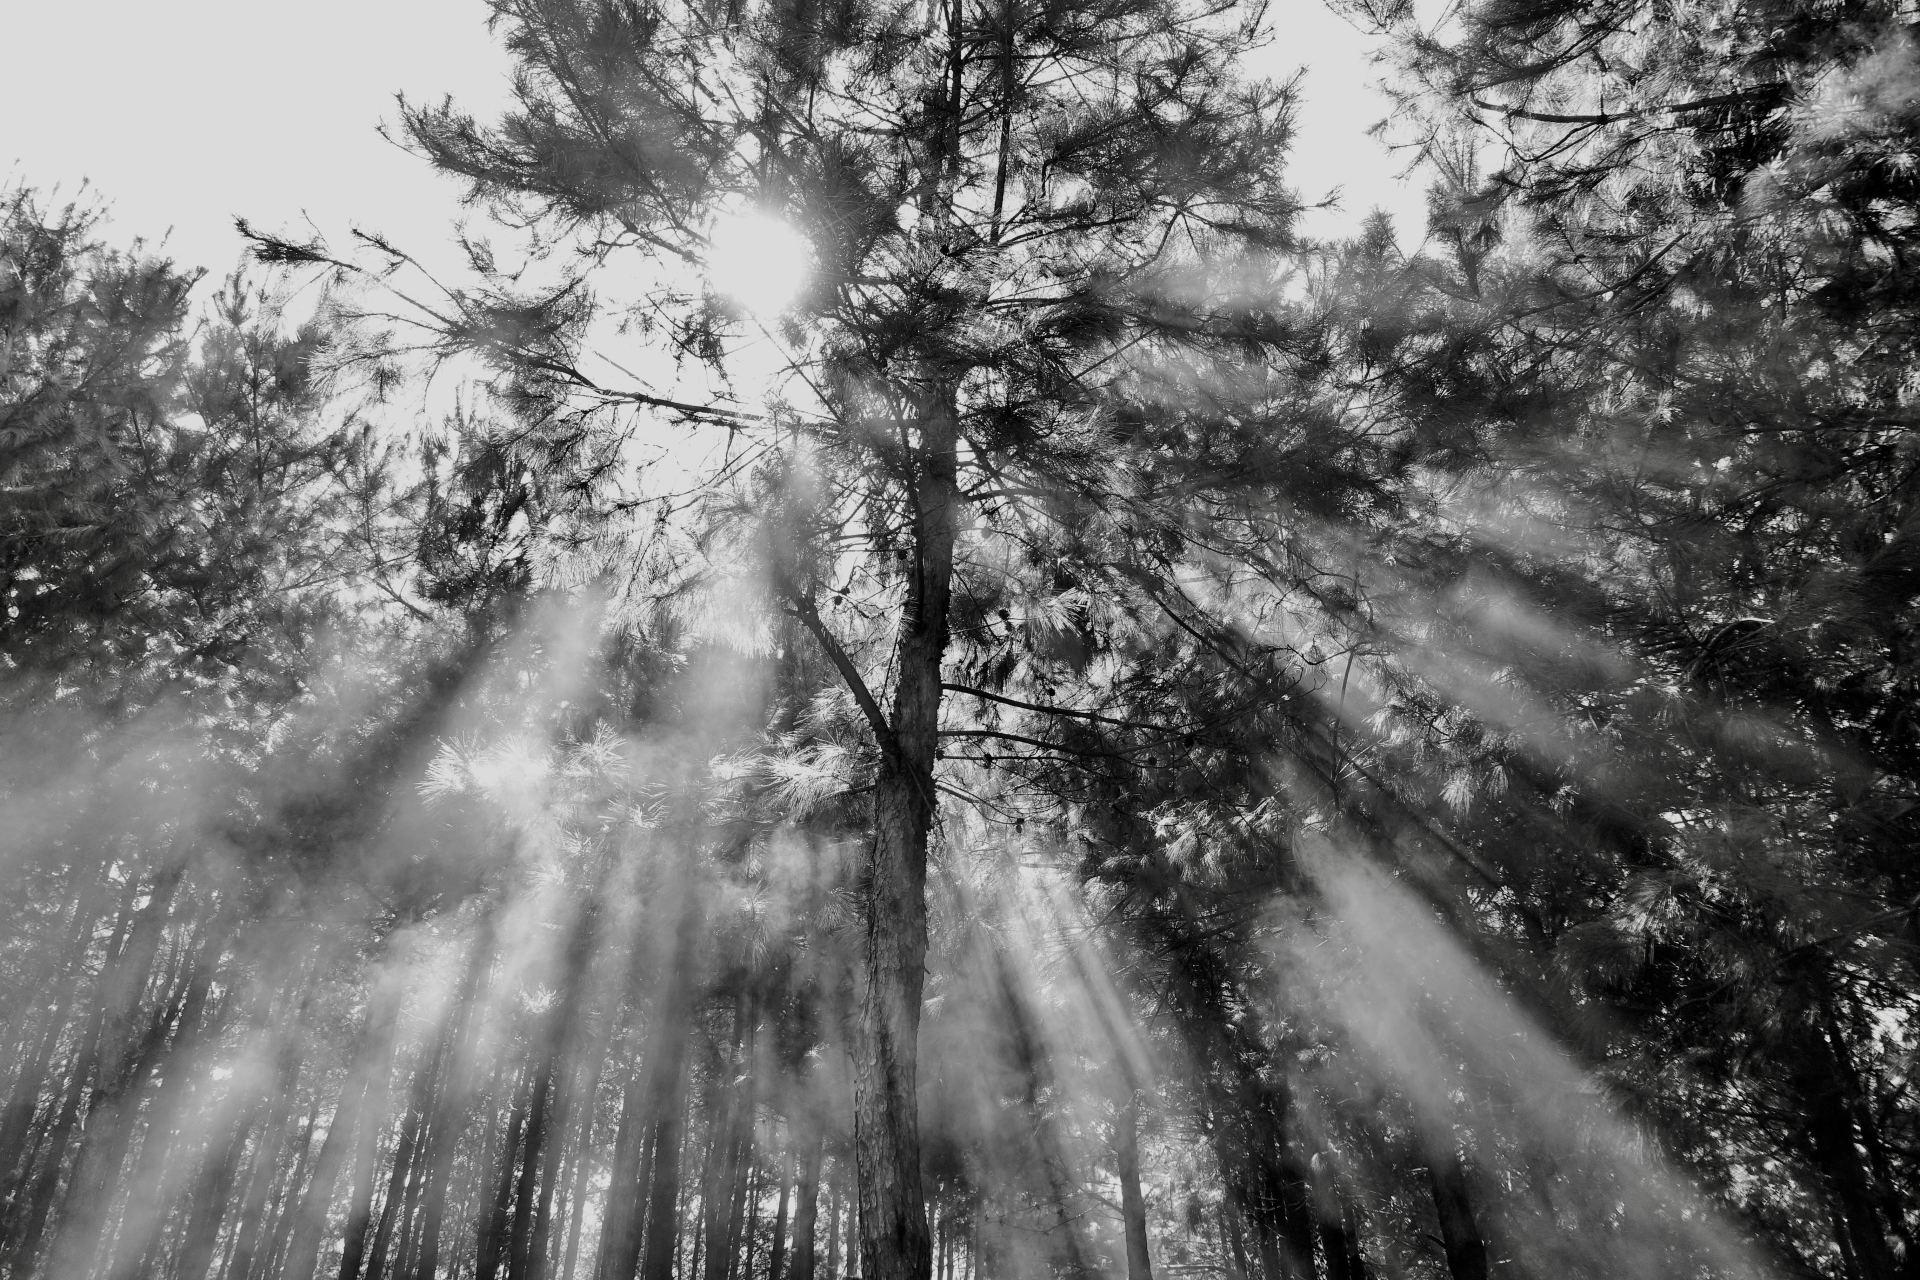 Flickering Lights Spiritual Meaning